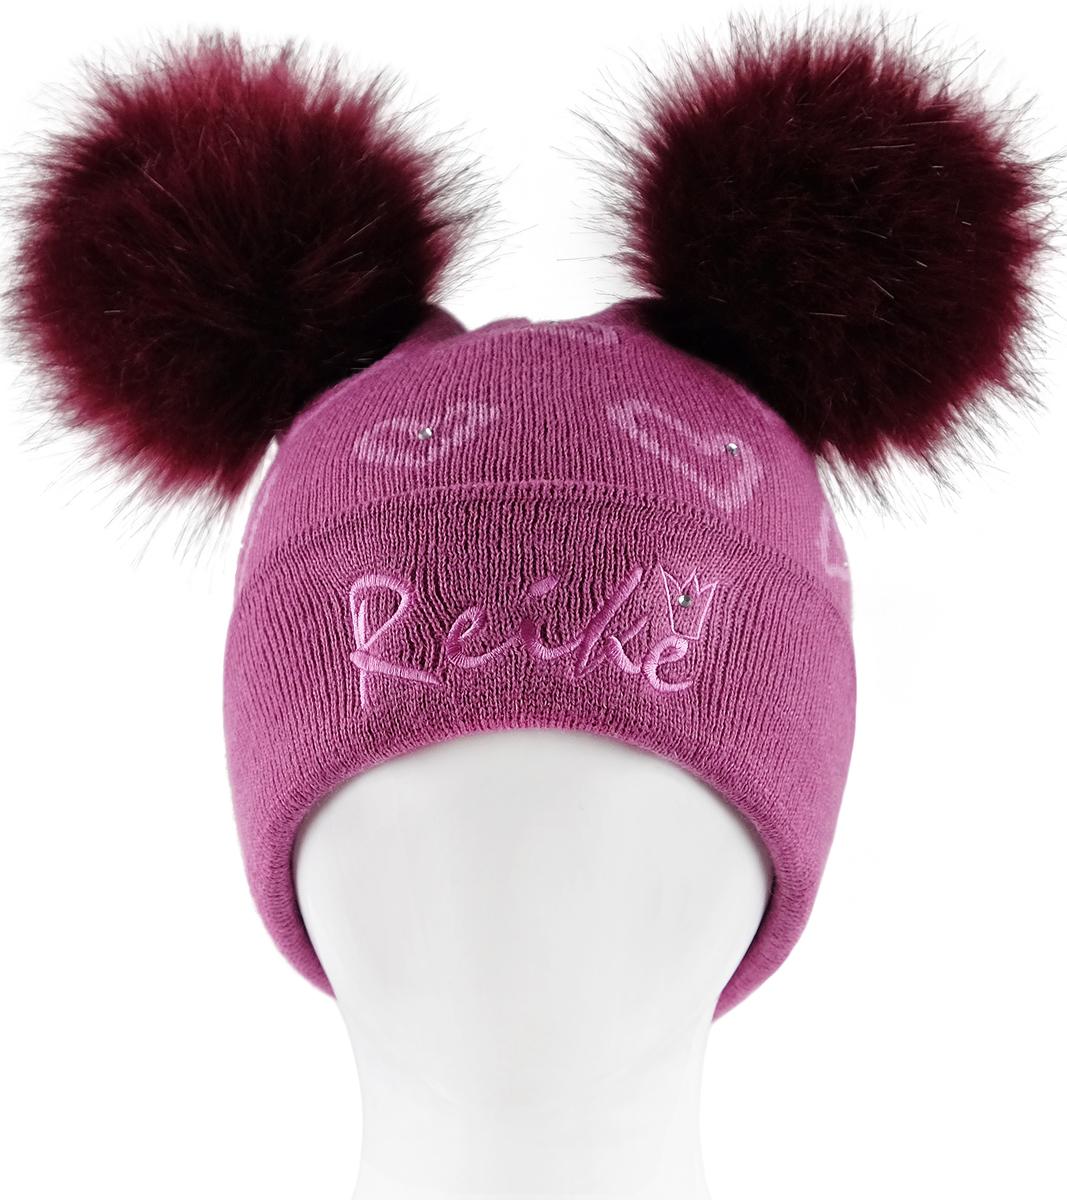 Шапка для девочек Reike, цвет: фуксия. RKN1718-2_PRC fuchsia. Размер 52RKN1718-2_PRC fuchsia